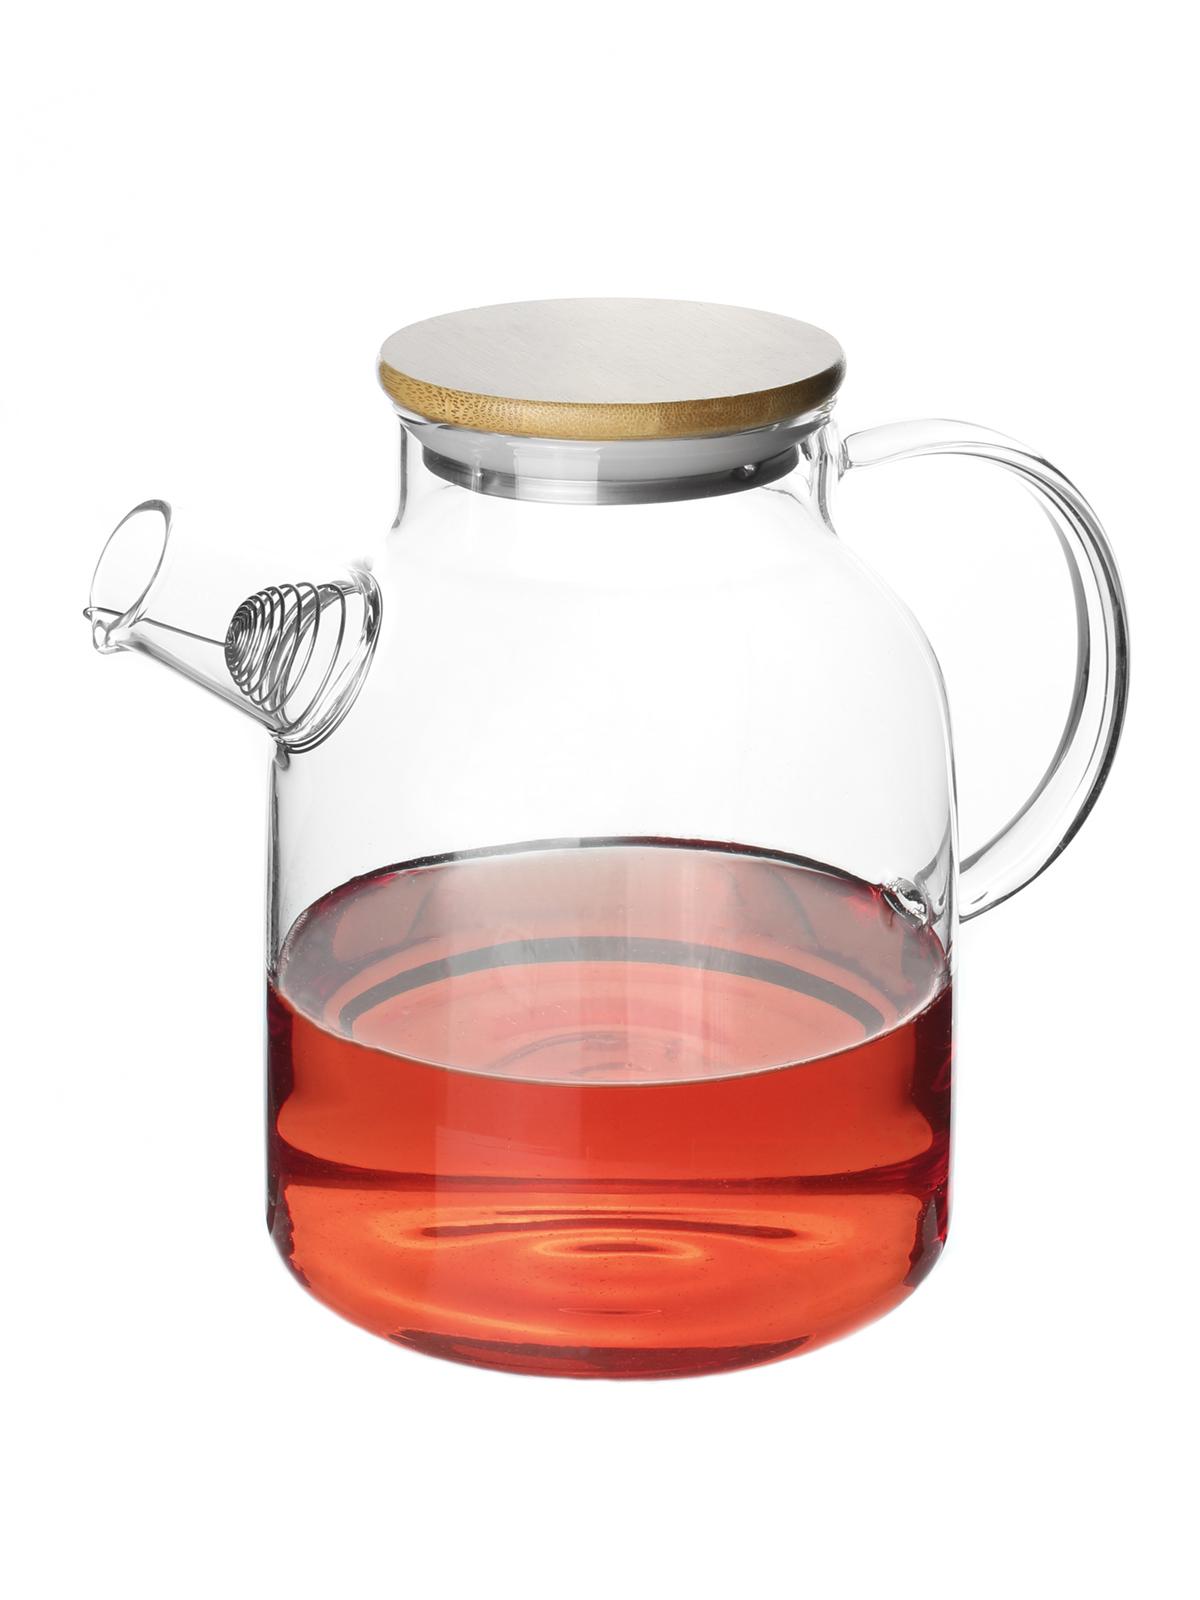 Заварочный чайник Joy Бочонок 1500 мл 5092/ по цене 1 589